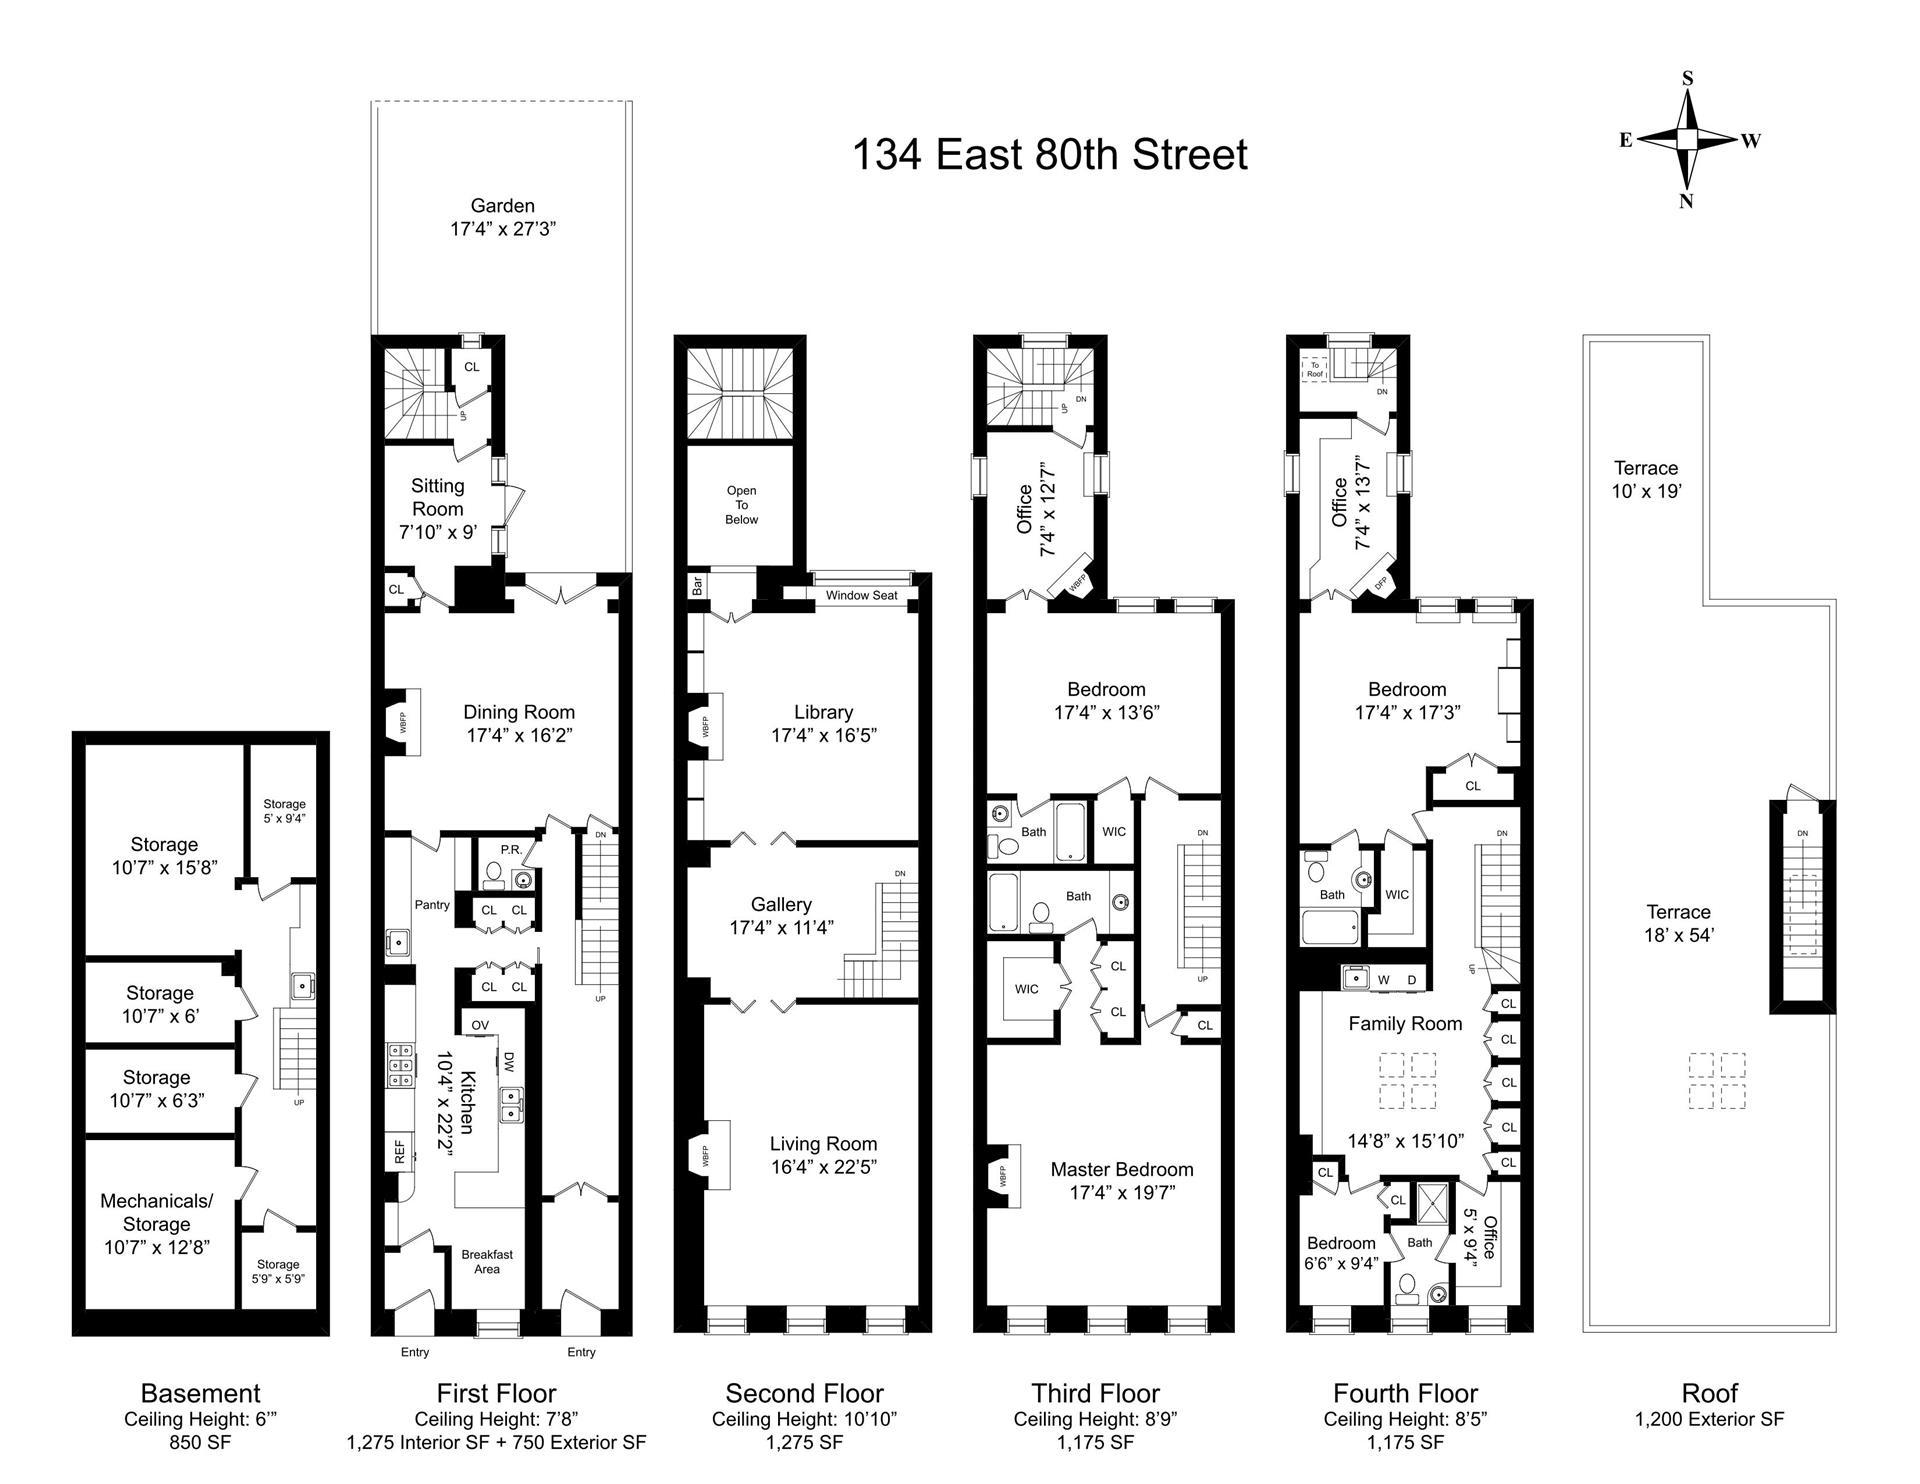 Floor plan of 134 East 80th Street - Upper East Side, New York